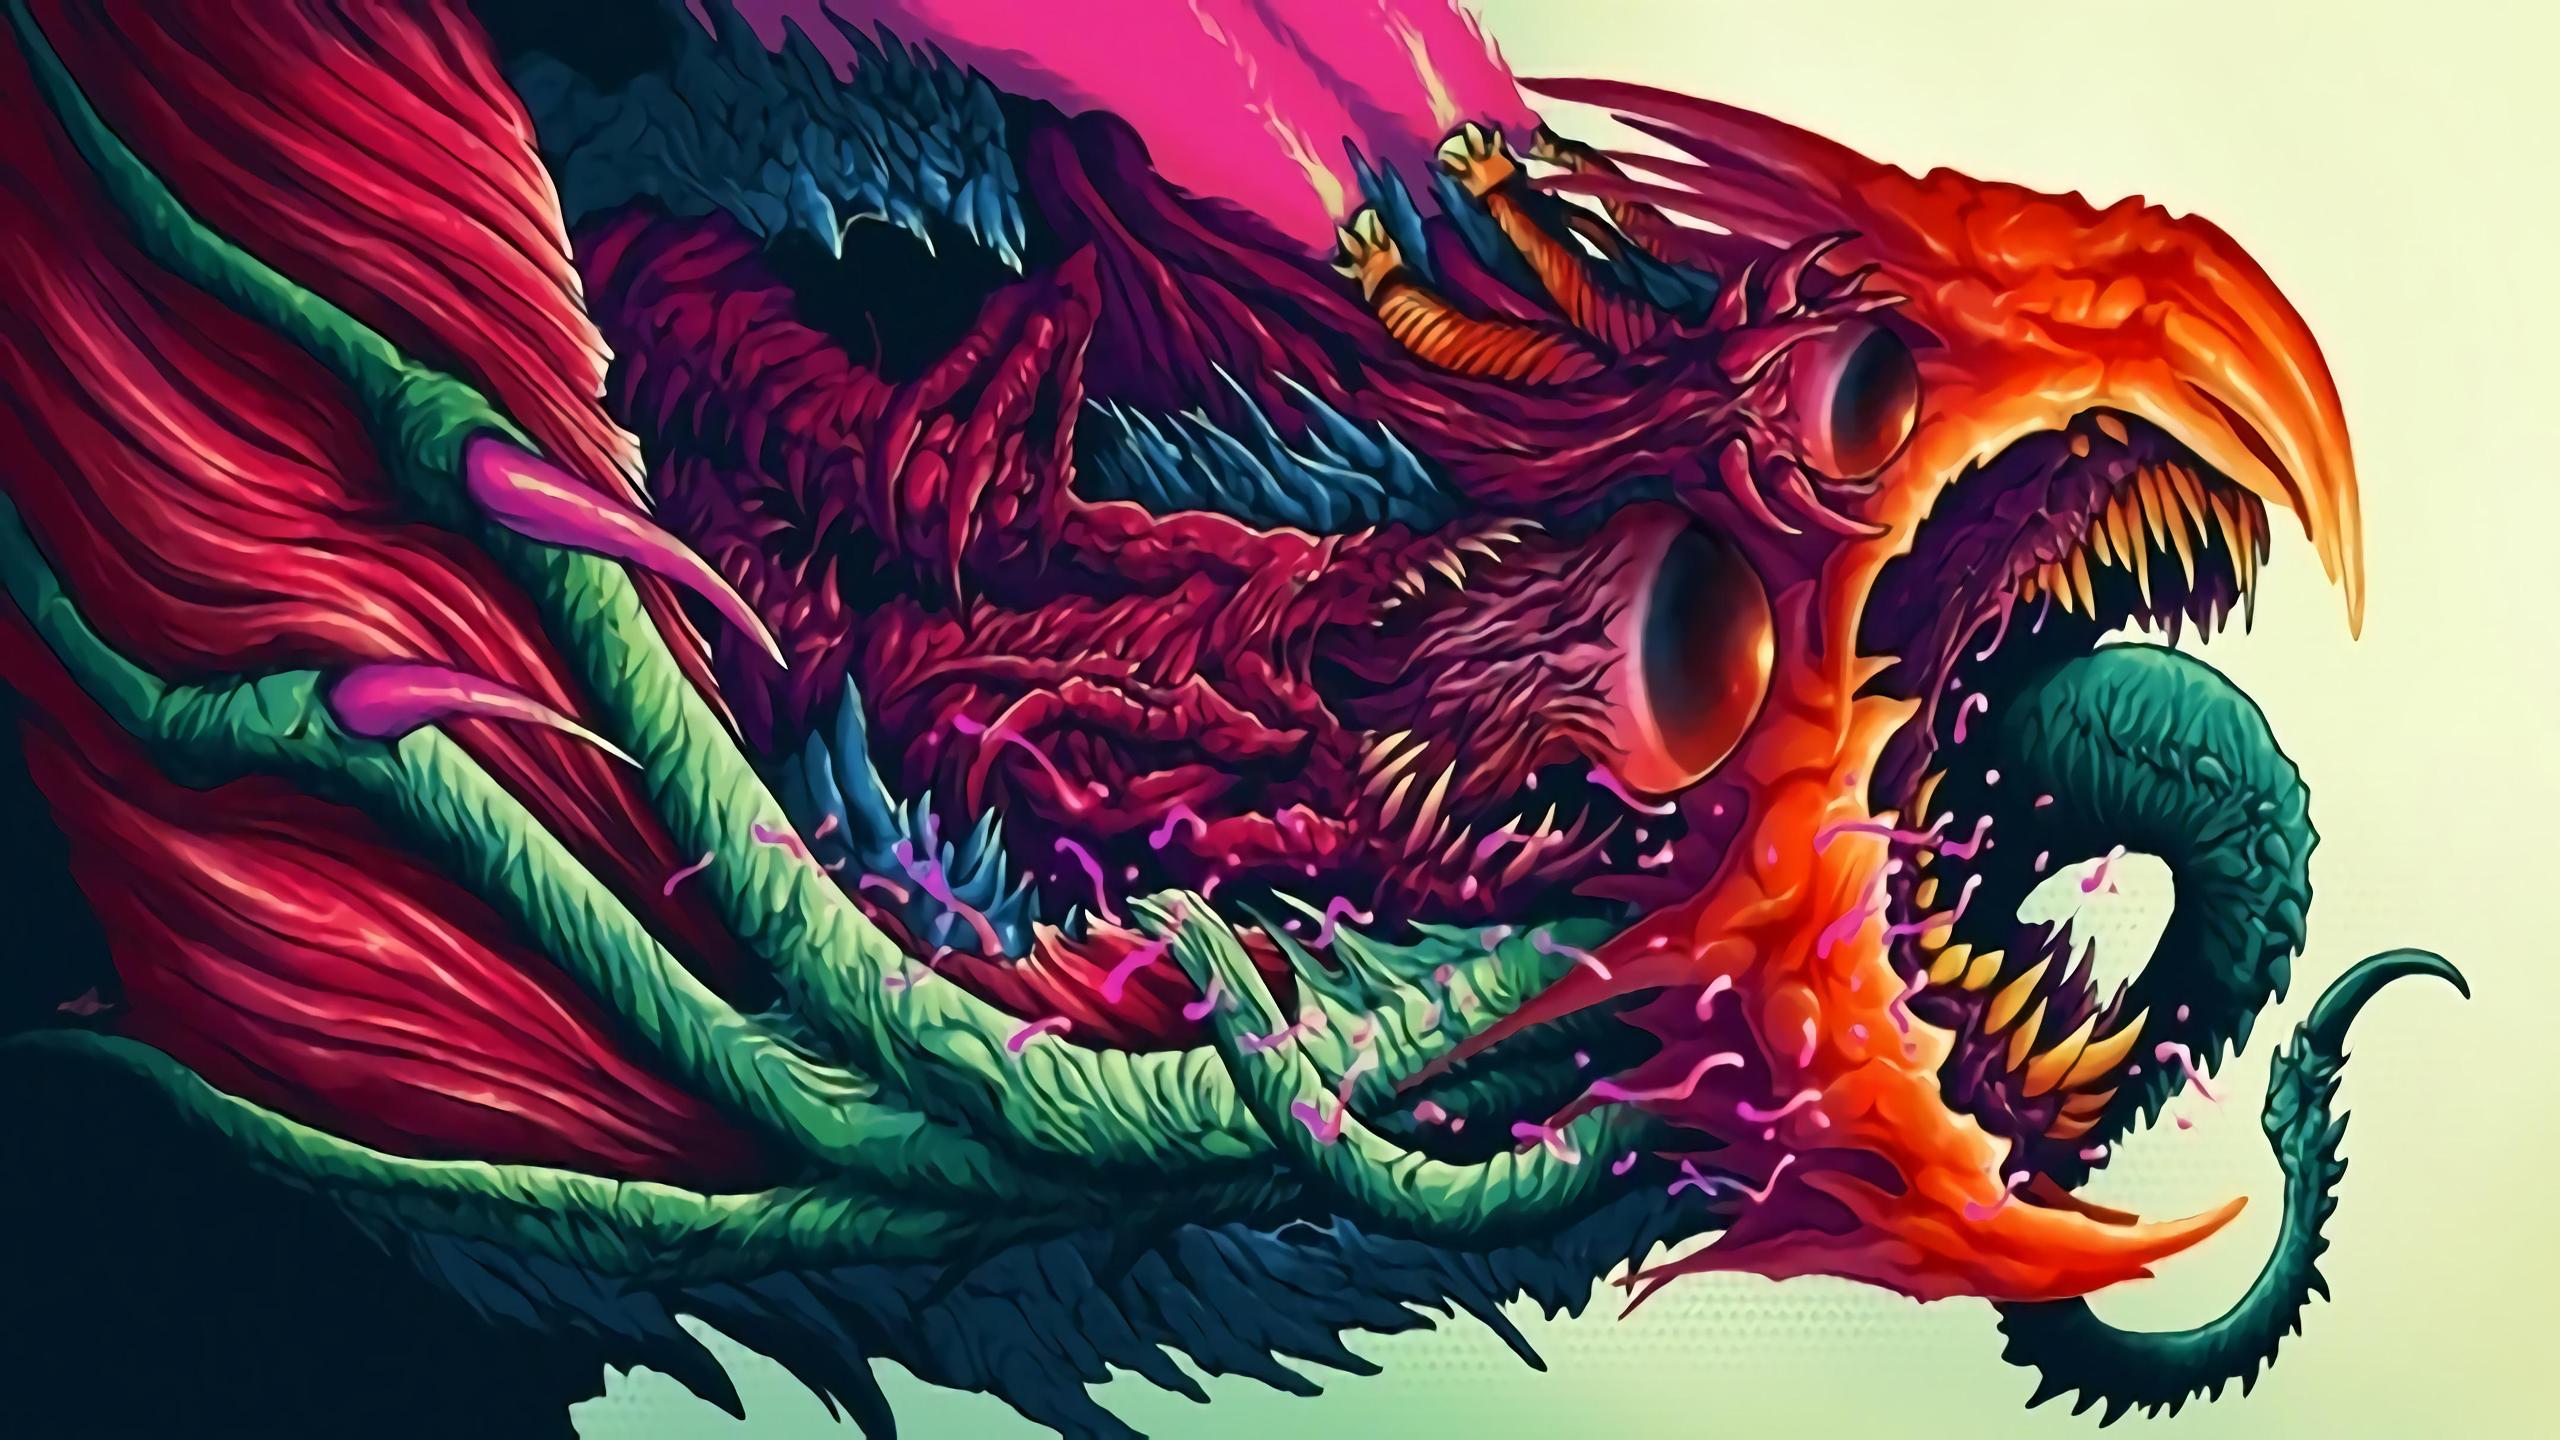 Hyper Beast 2 2560x1440 2560x1440 Wallpaper Arte Bizarro Arte De Videojuegos